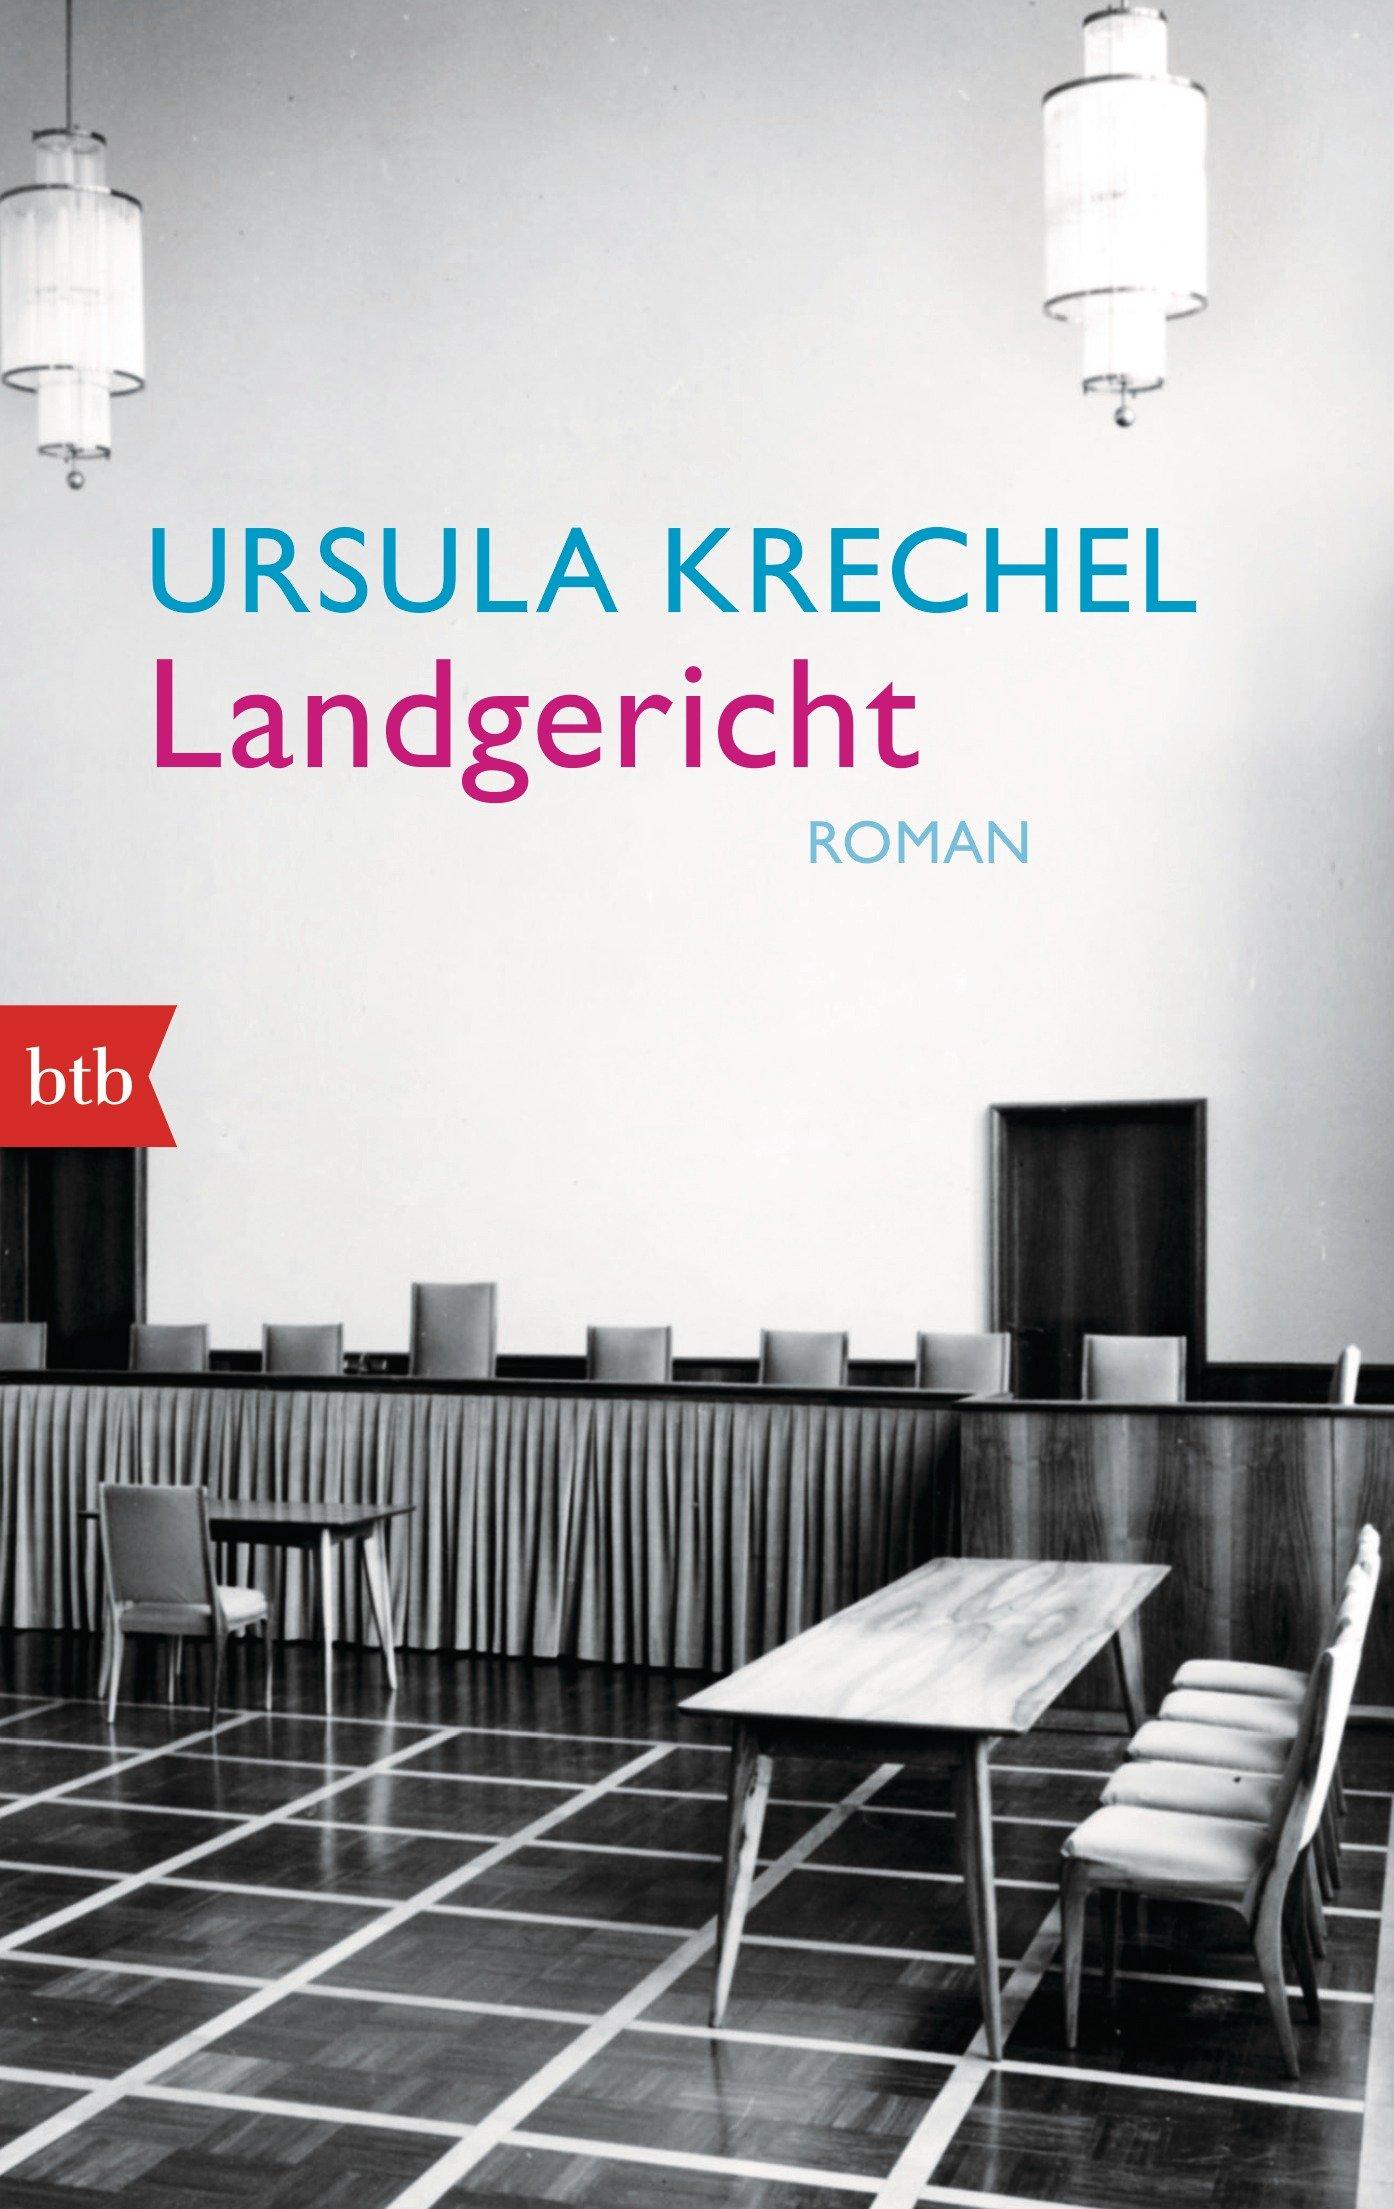 krechel - Ursula Krechel [Allemagne] 813LuX8qufL